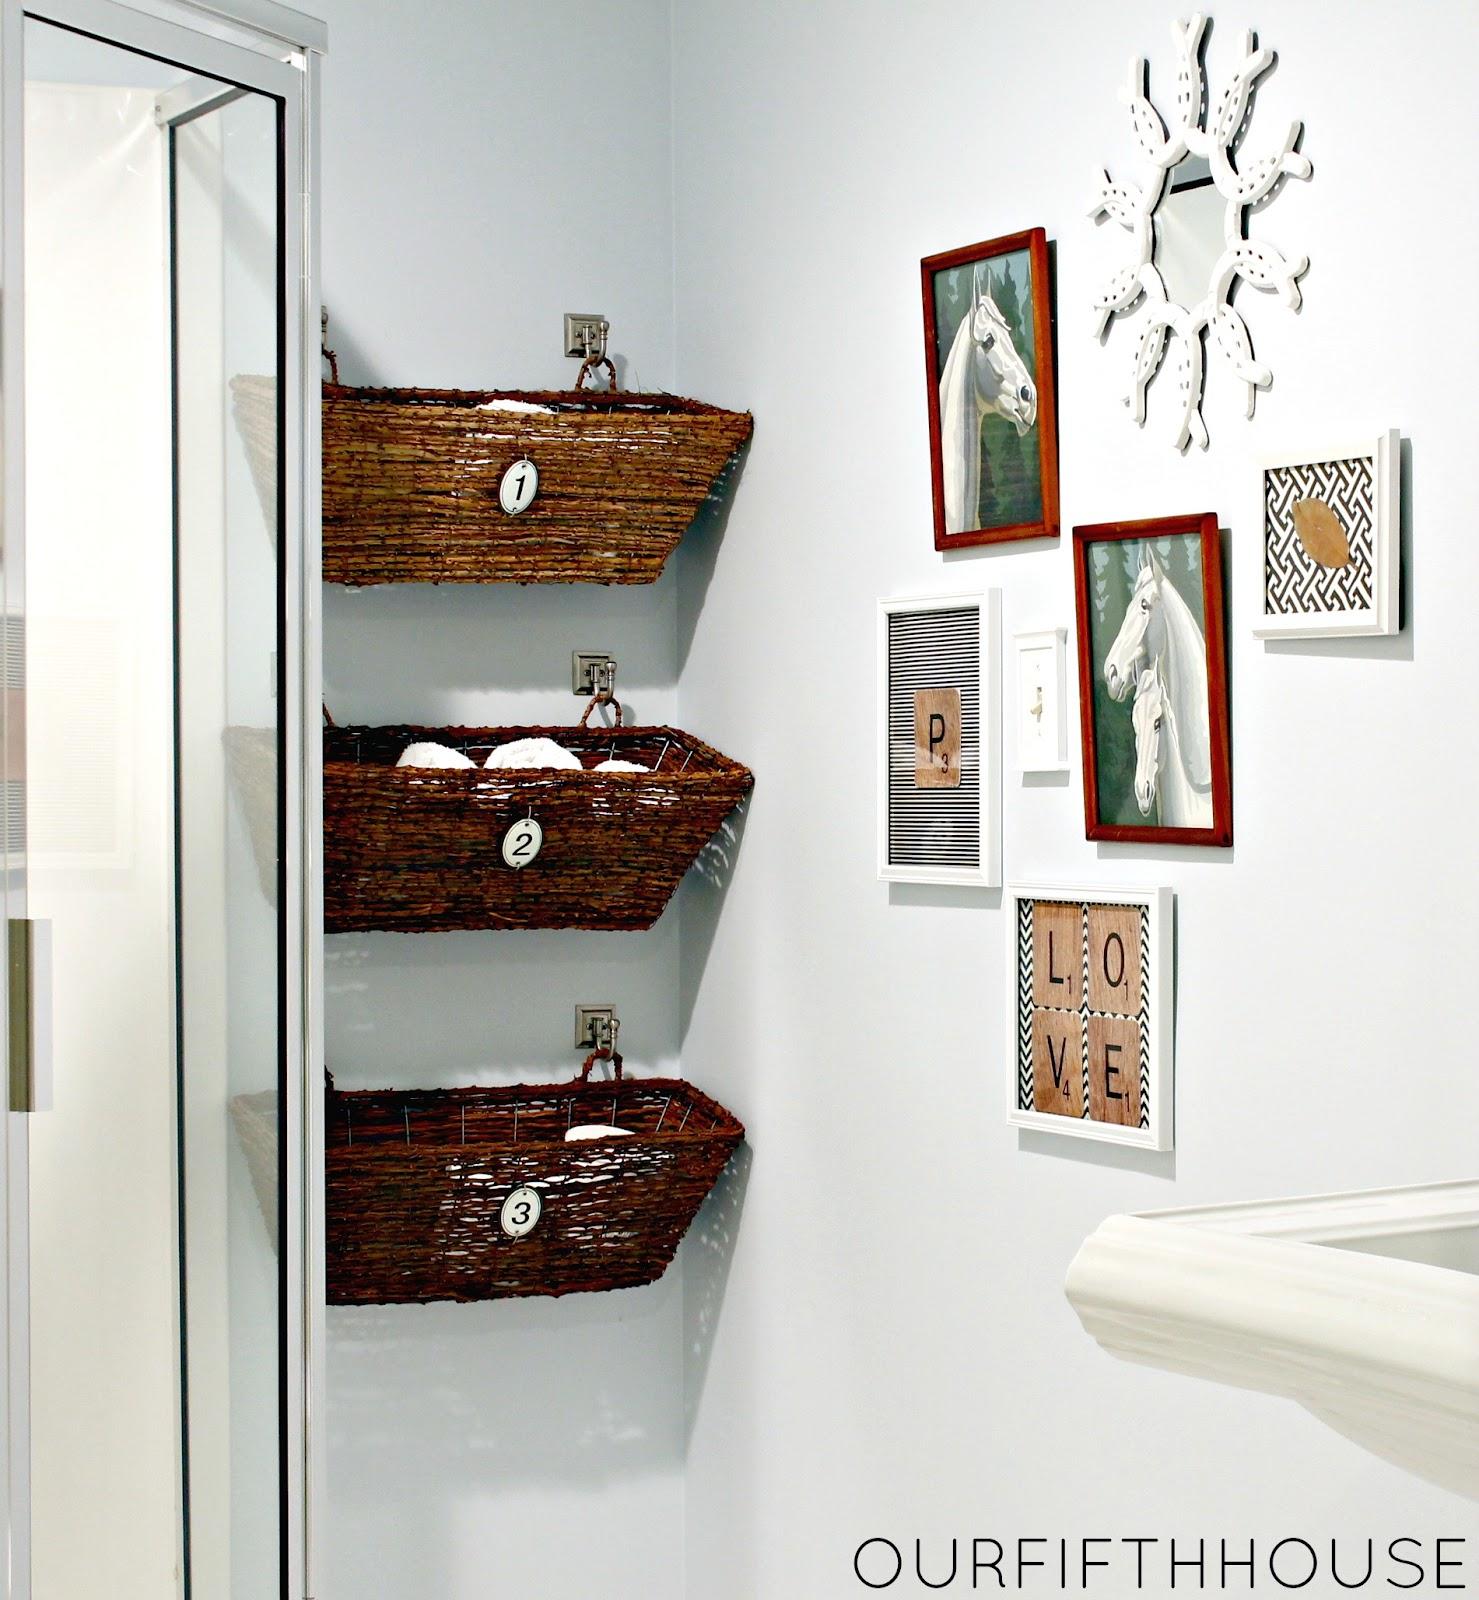 Basket Arrange The Towels In Your Bathroom (Image 1 of 10)